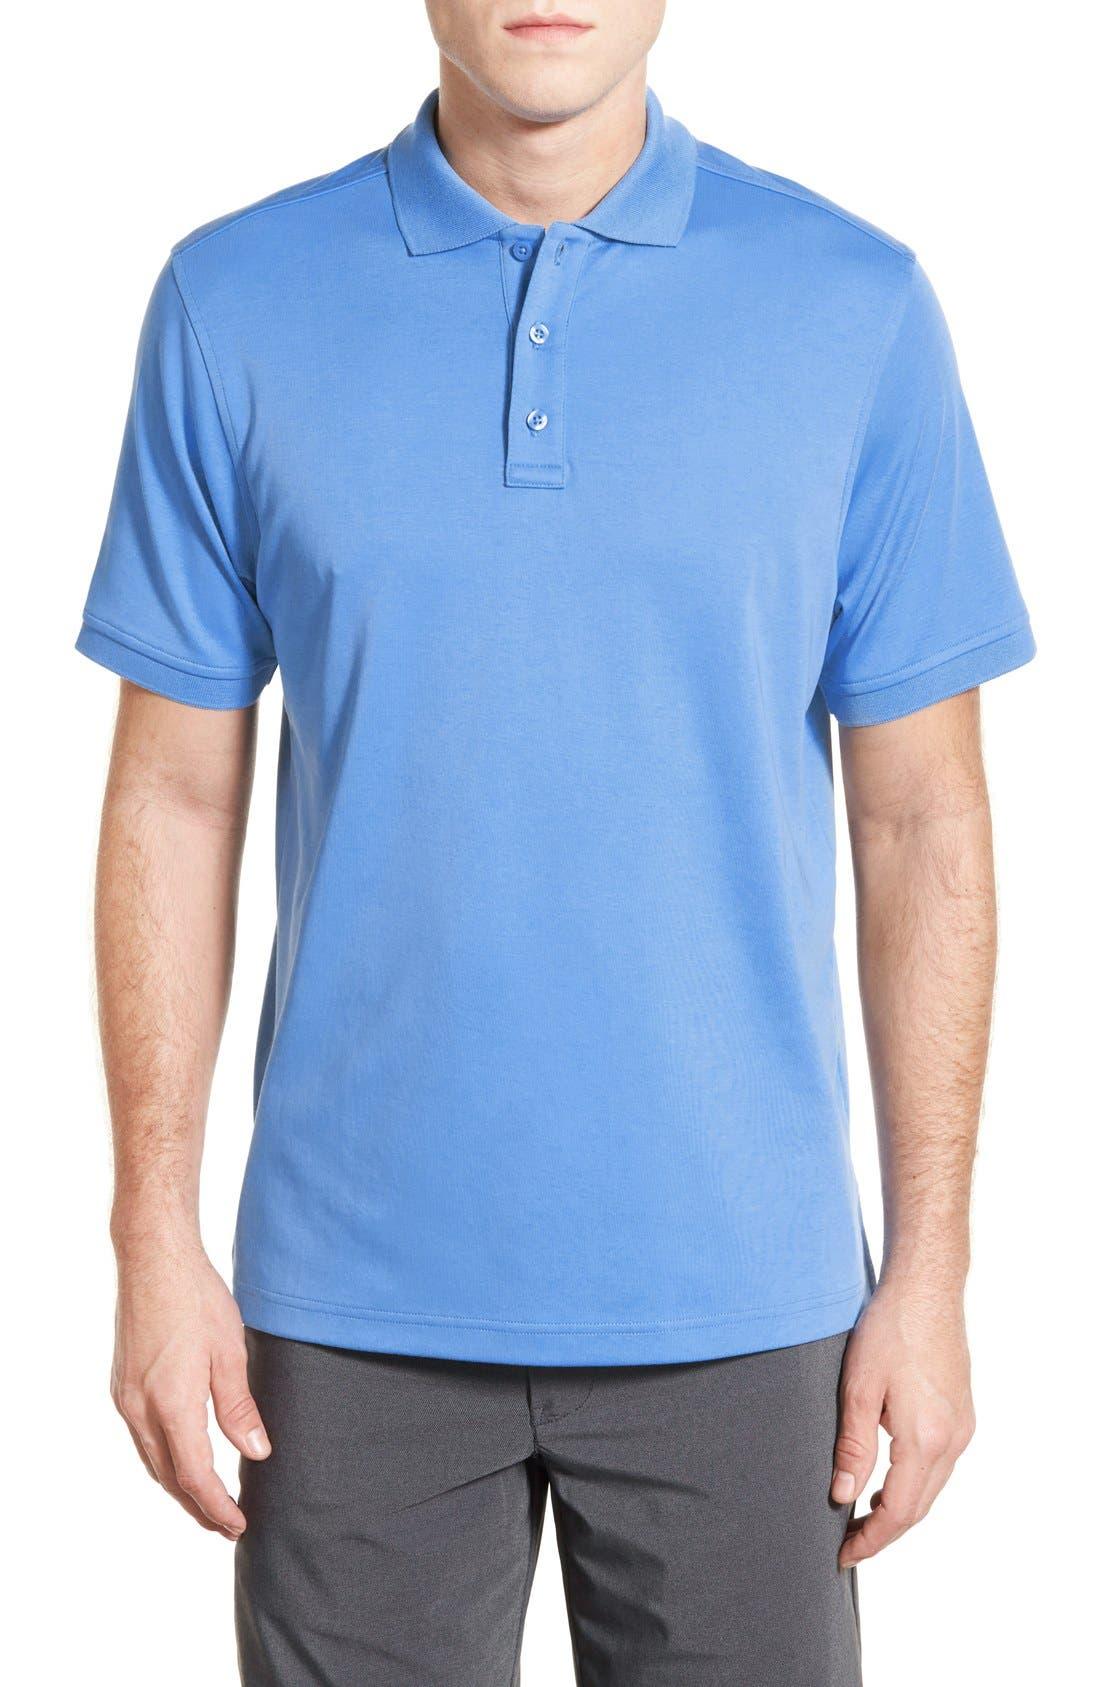 Alternate Image 1 Selected - Nordstrom Men's Shop Regular Fit Interlock Knit Polo